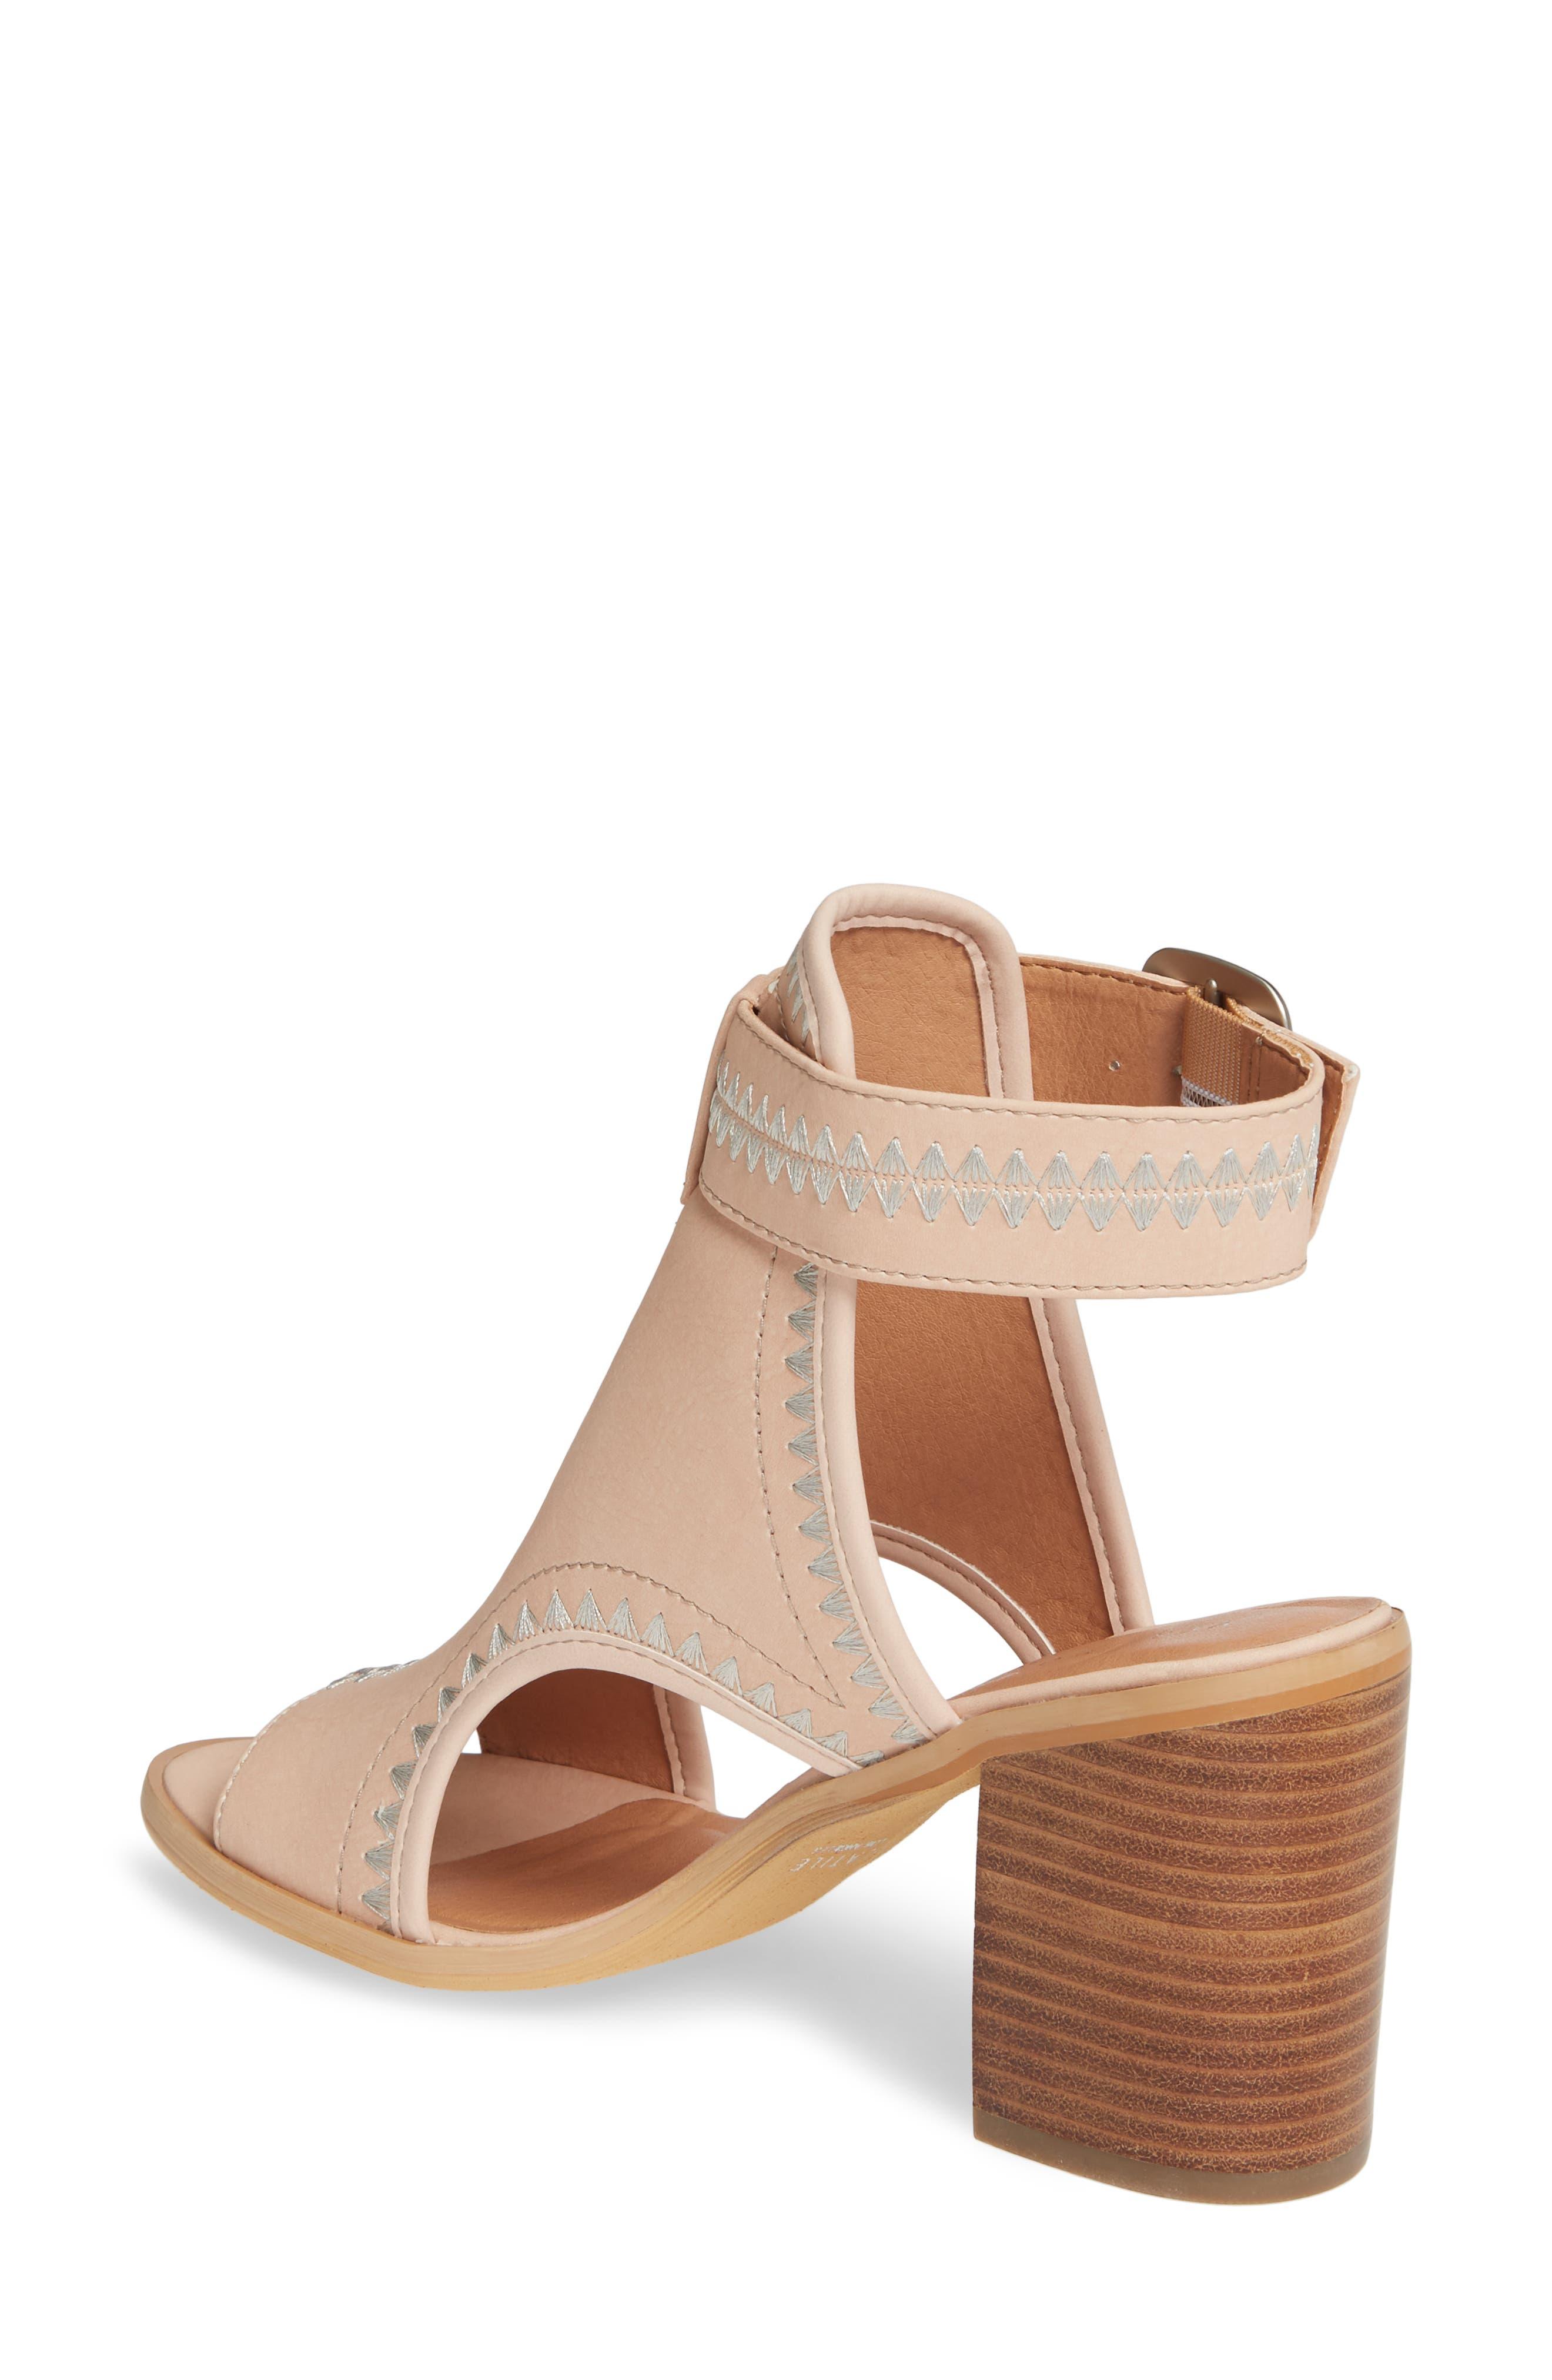 4b521c5a4 Women s Very Volatile Sandals